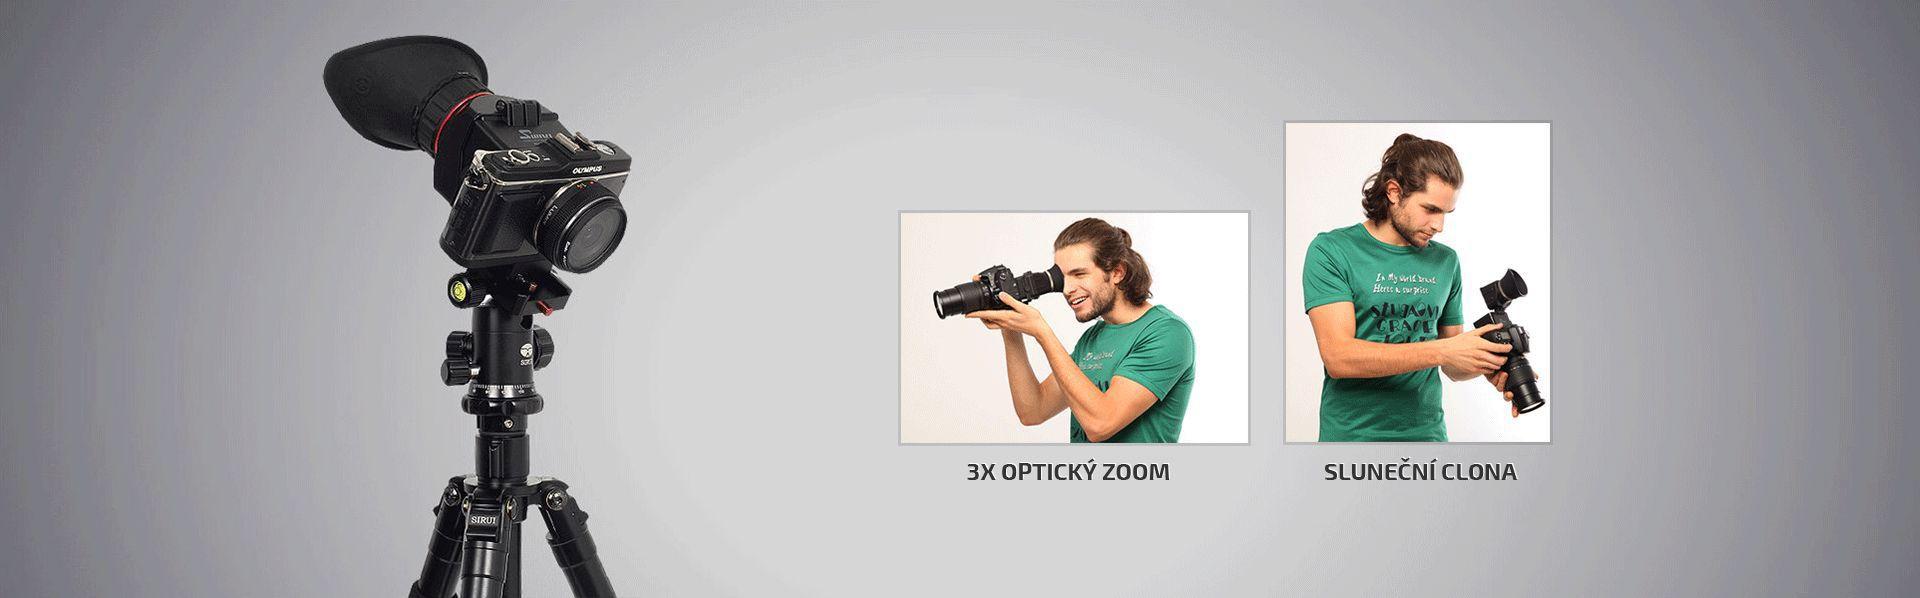 film-technika-ggs-s4-intext3